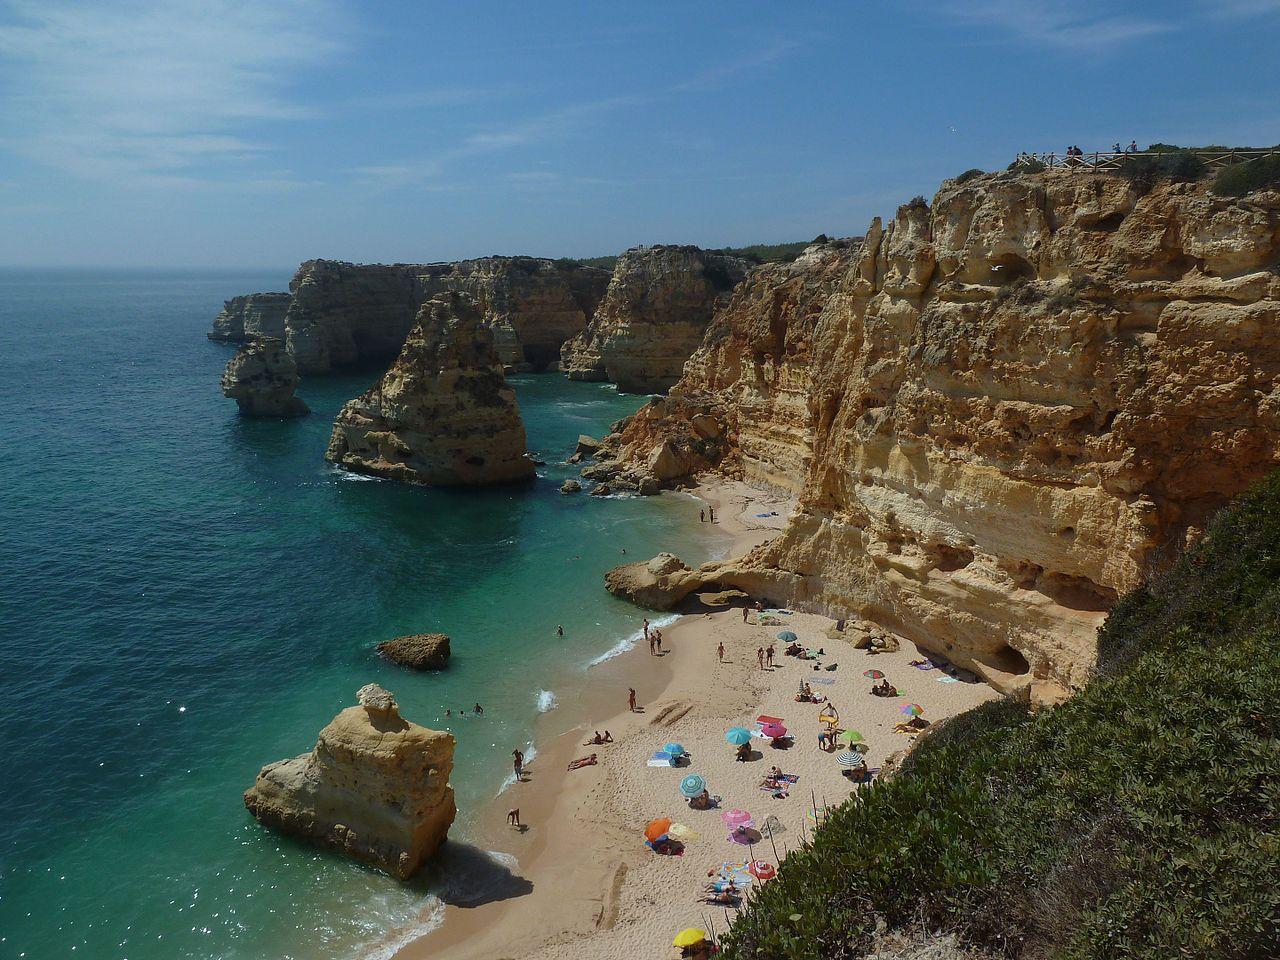 Praia da Marinha, Best Beaches in Portugal